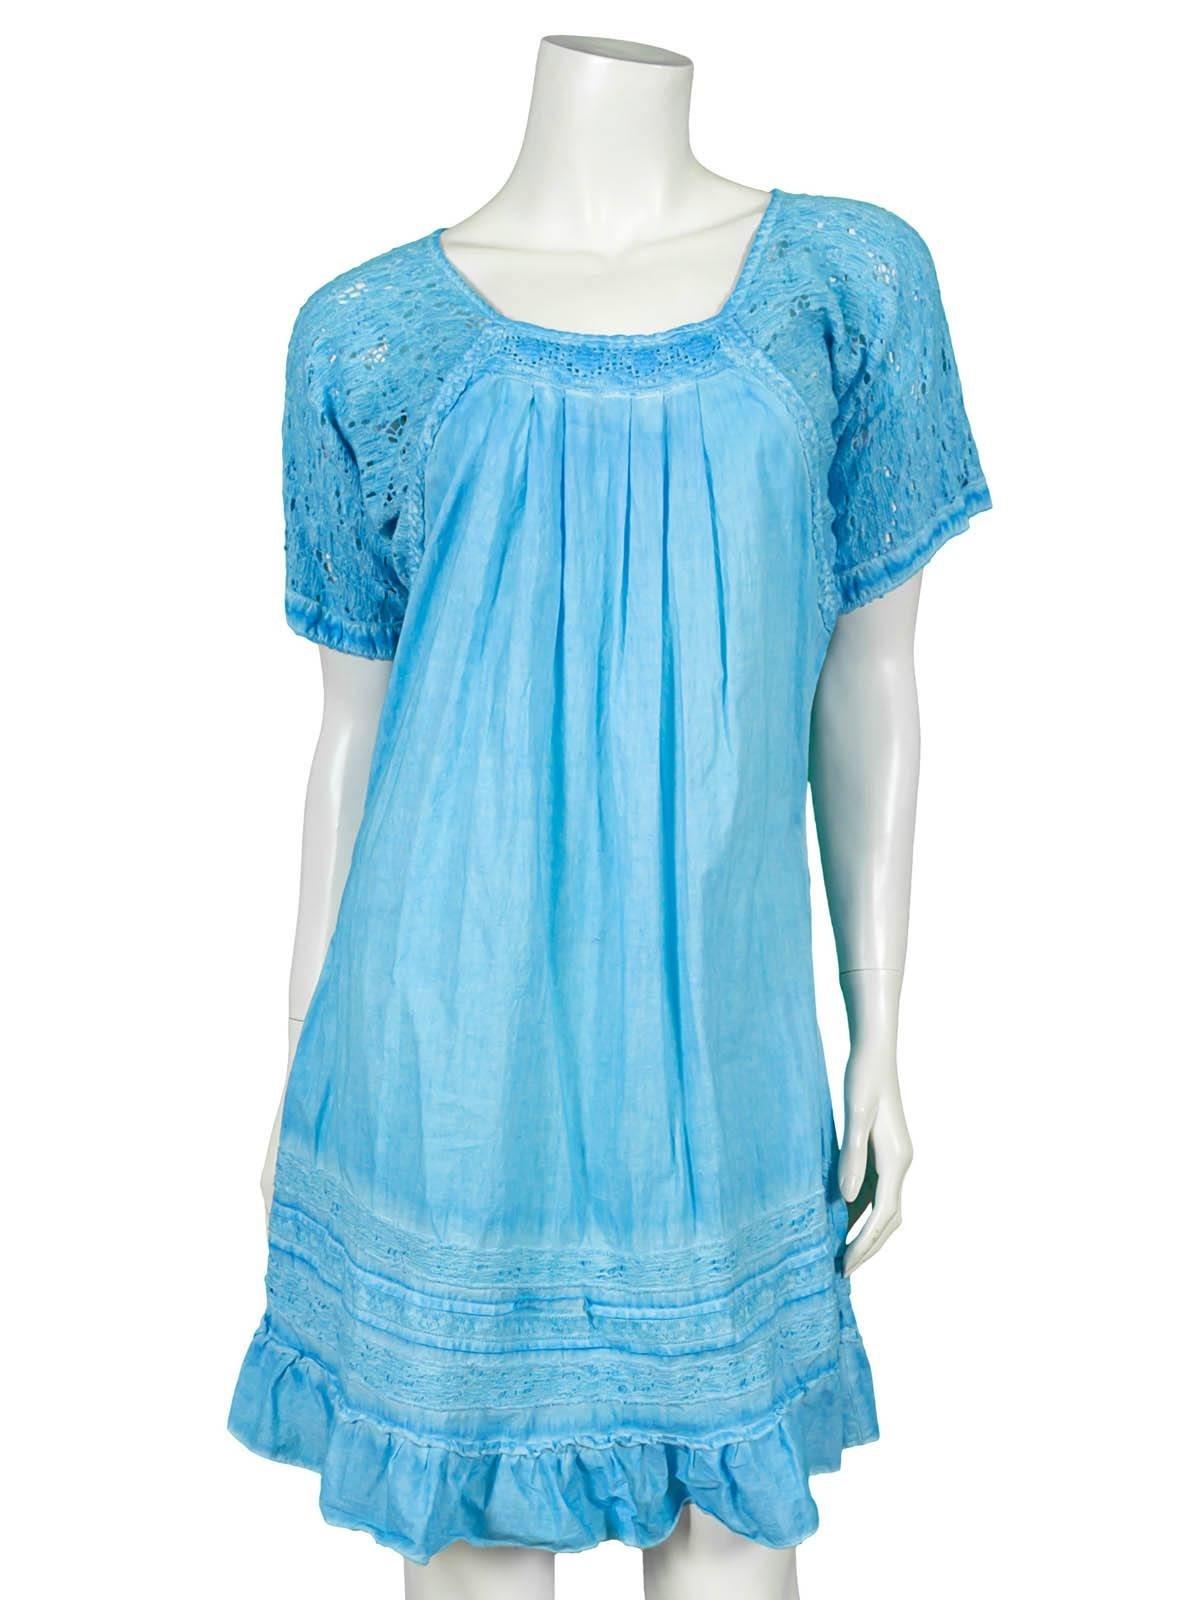 10 Einzigartig Kleid Türkis Ärmel Luxus Kleid Türkis Ärmel